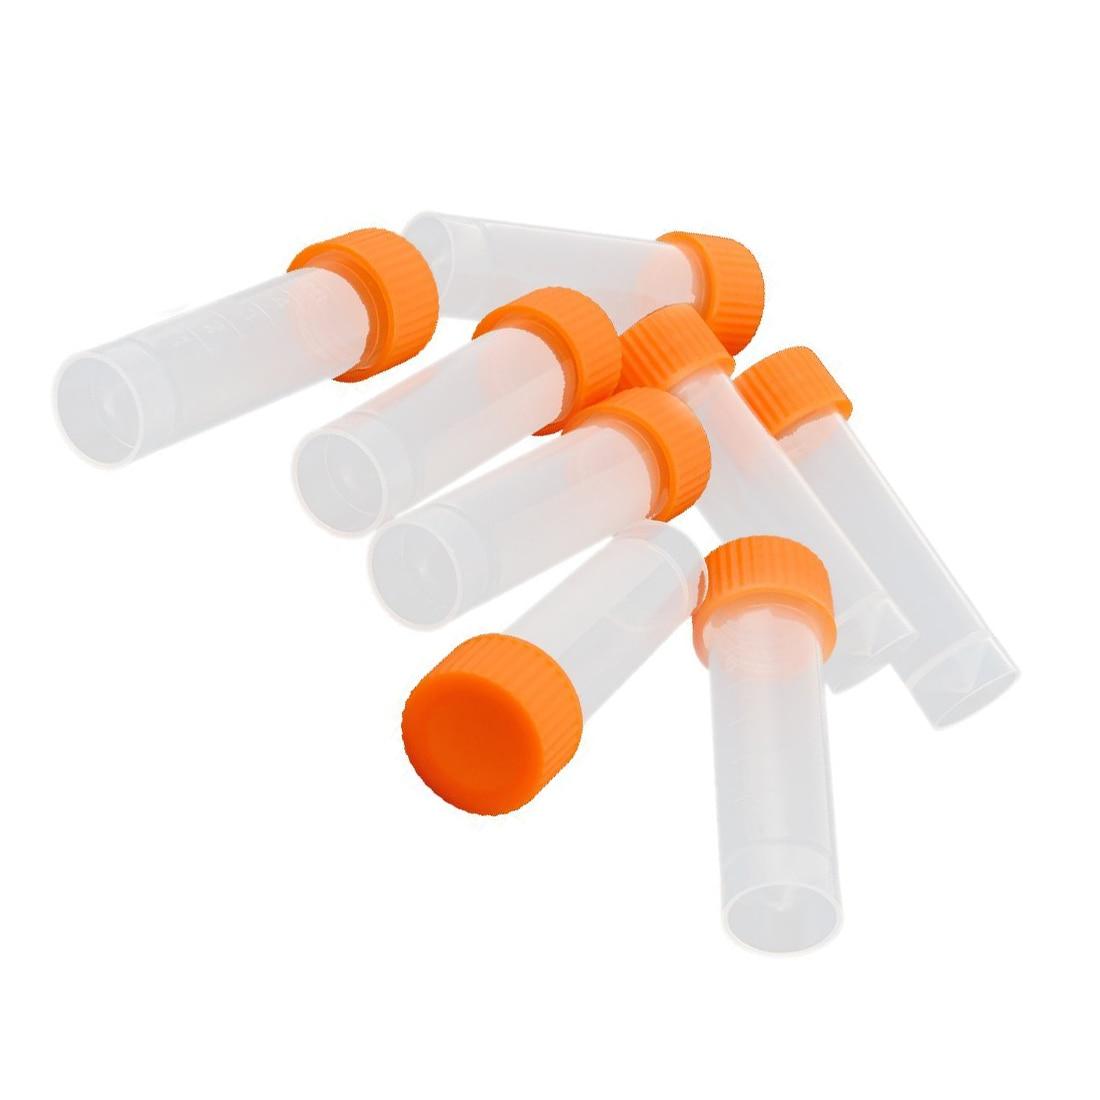 10 Pcs 5ml Conical Bottom Graduated Plastic Vial Tube